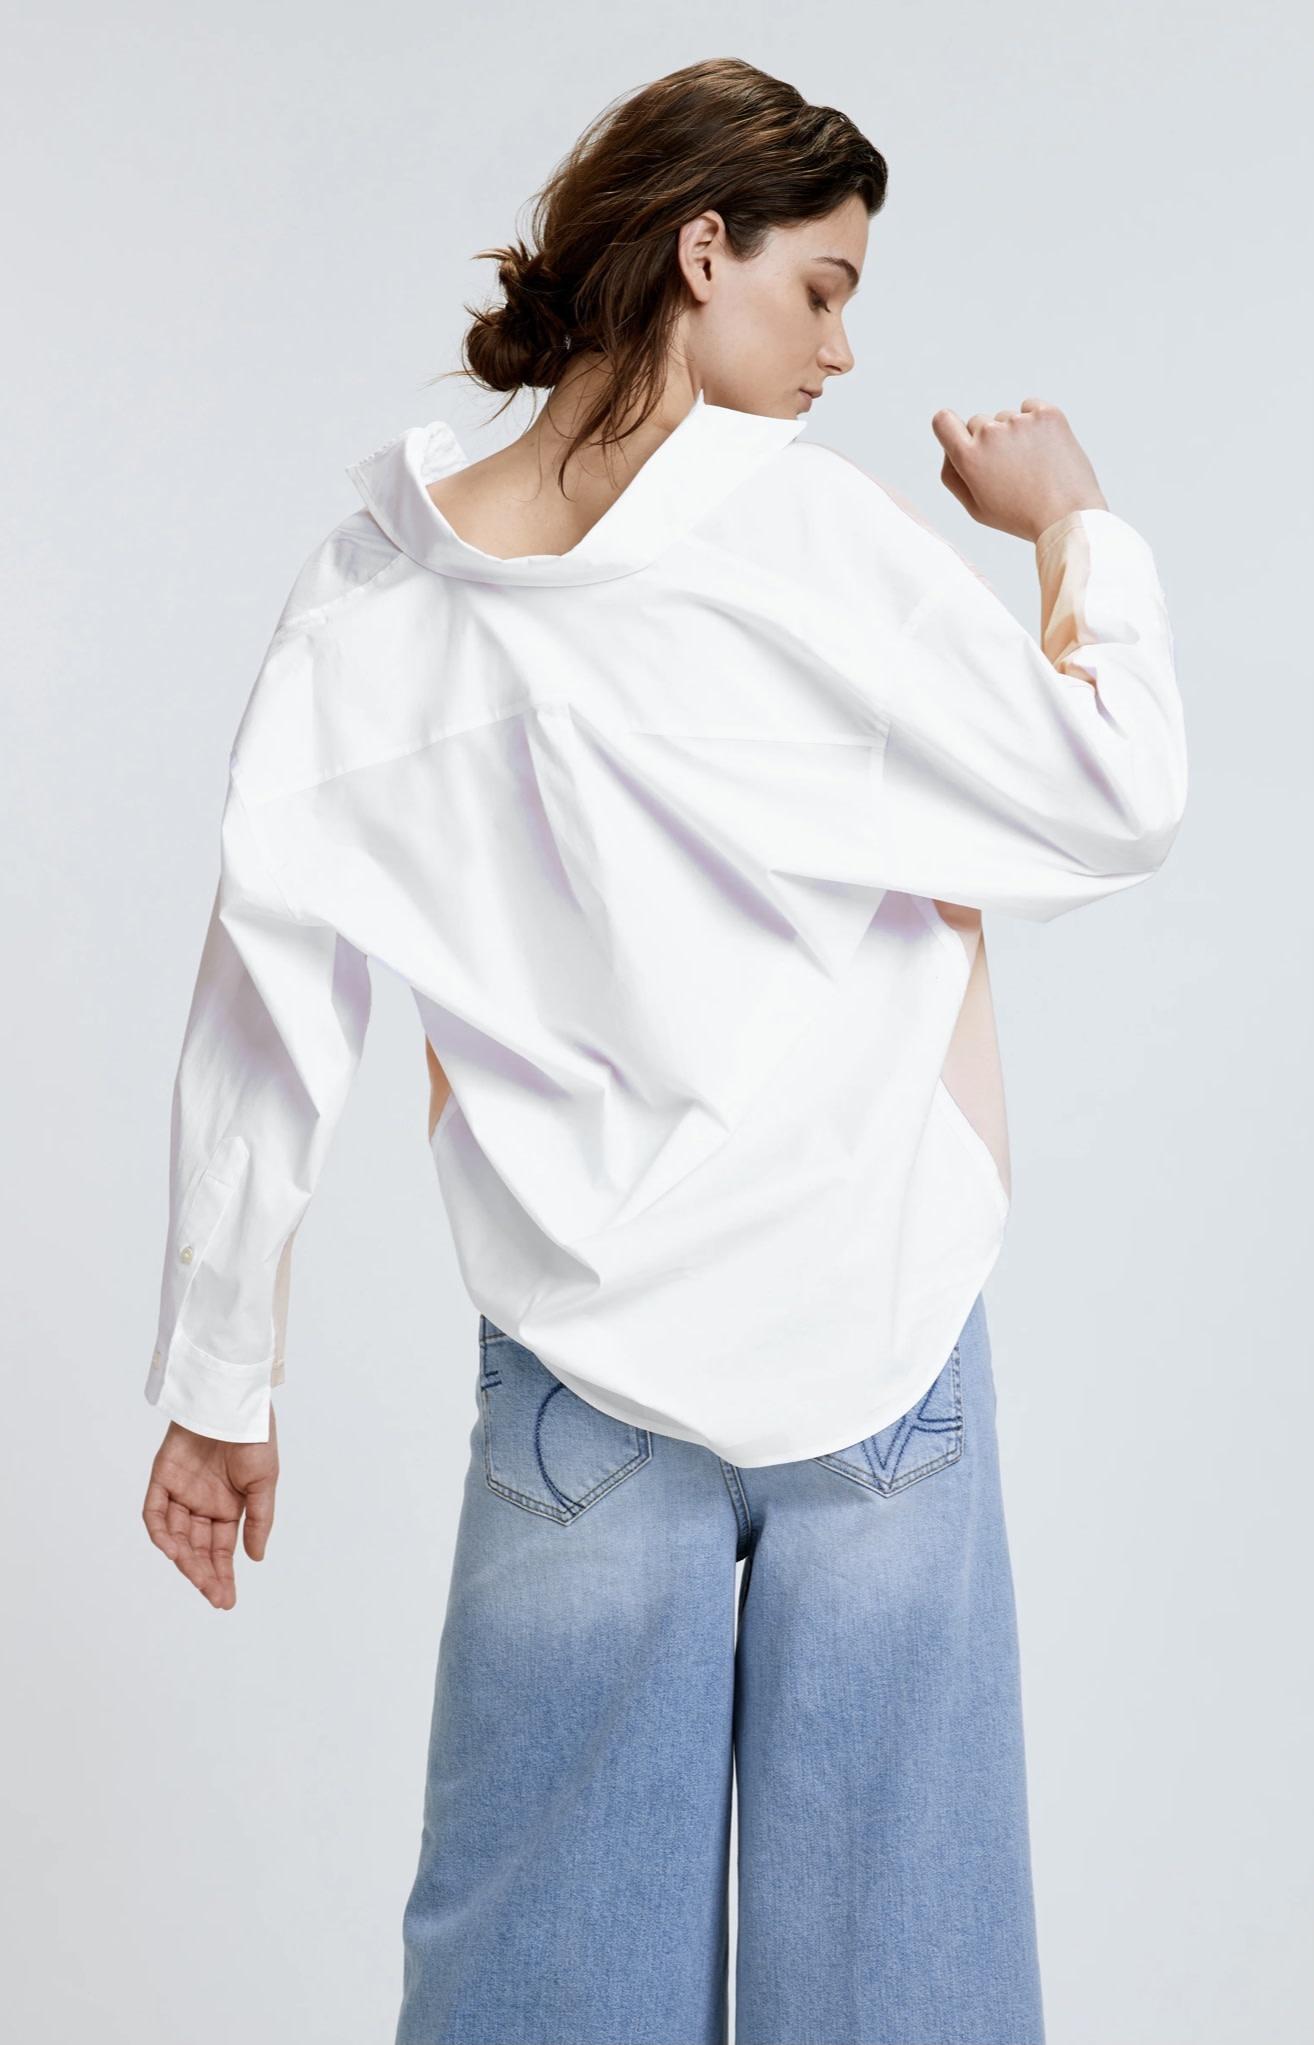 Cool contrast shirt dorothee schumacher-2